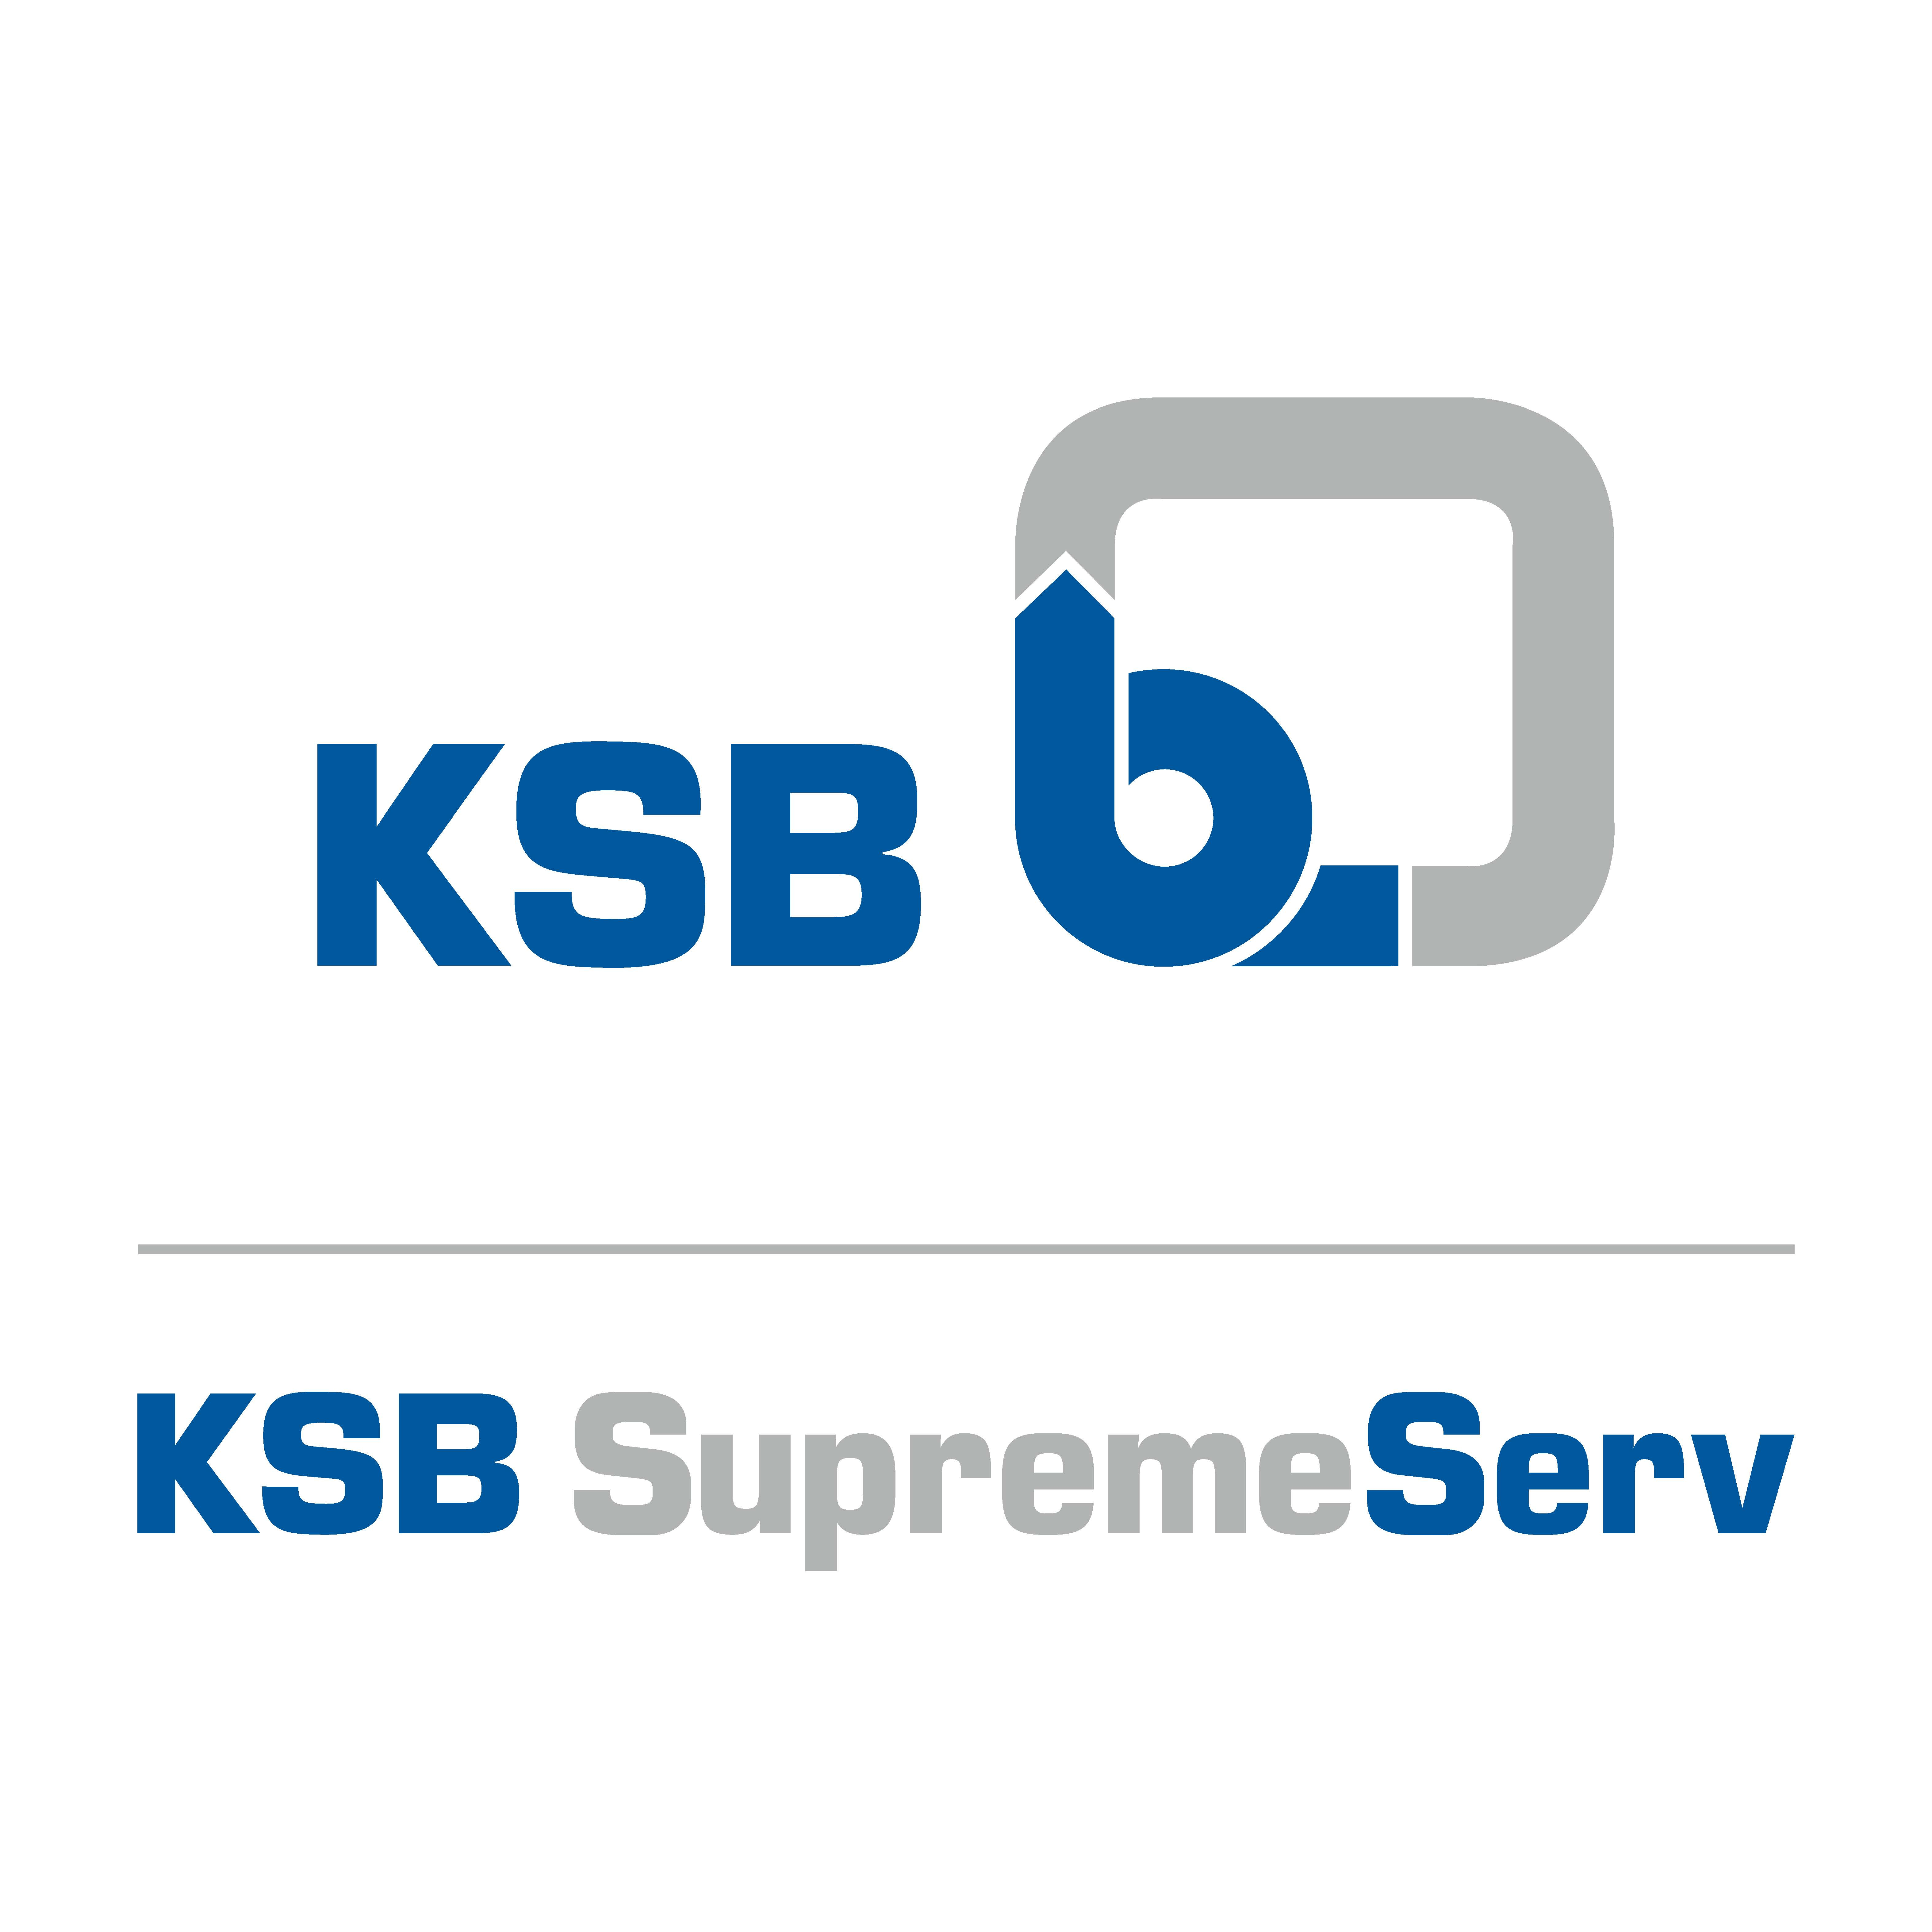 KSB Pumps and Valves Ltd